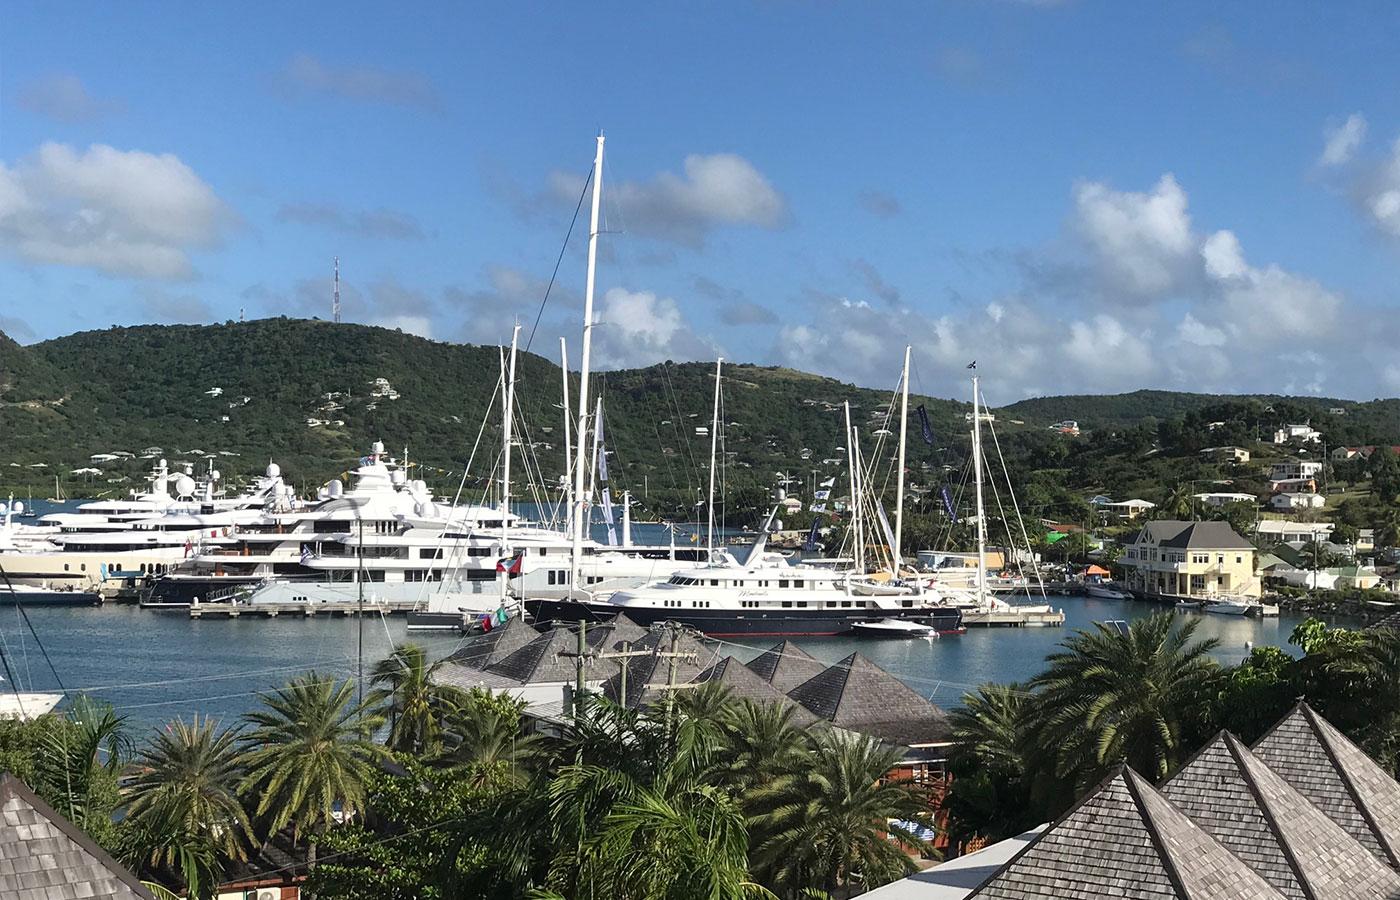 Antigua Charter Yacht Show 2019 [Event Recap]